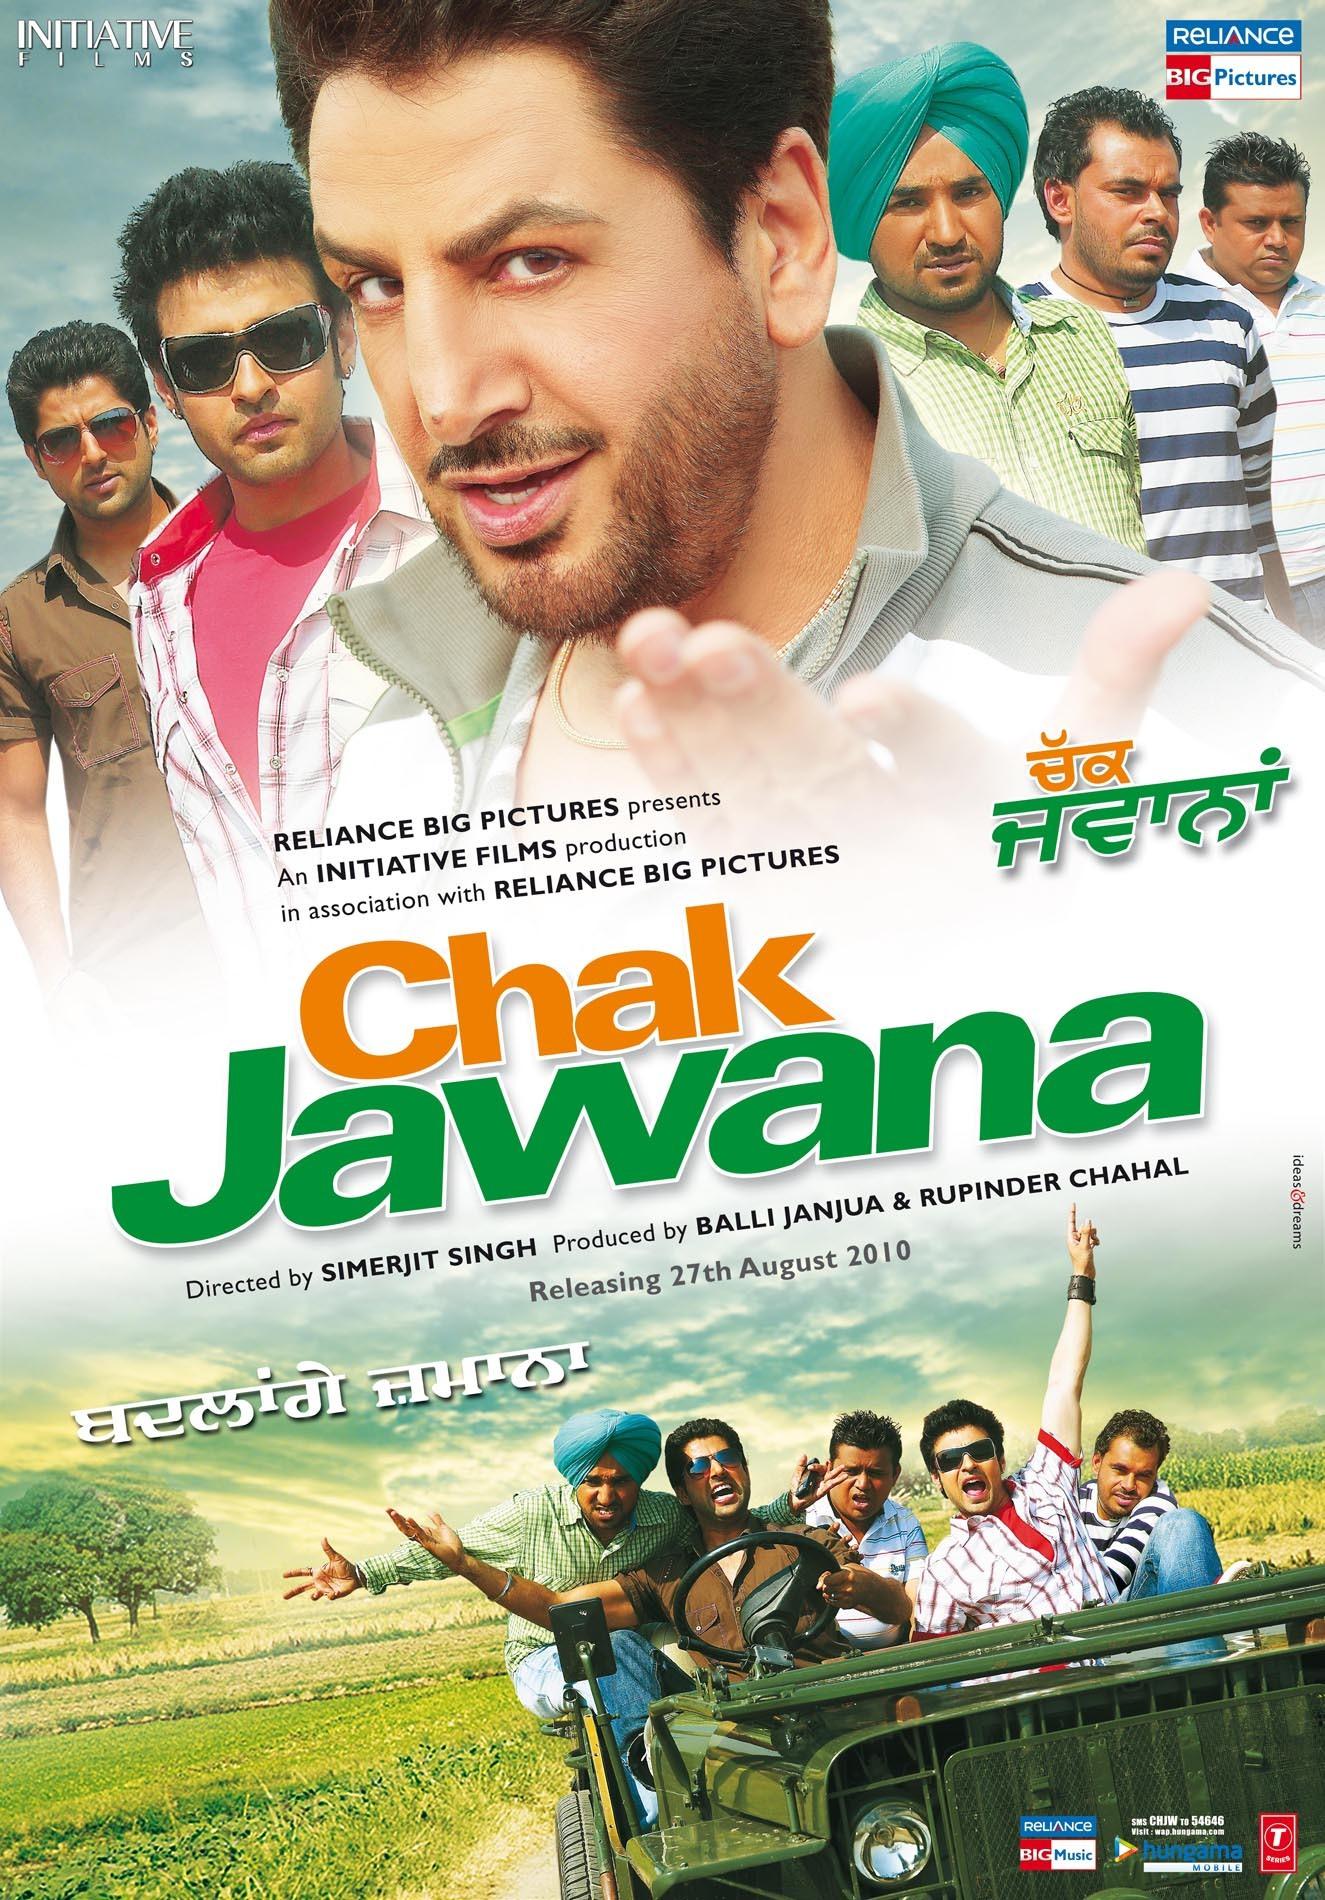 Gurdas Maan in Chak Jawana (2010)